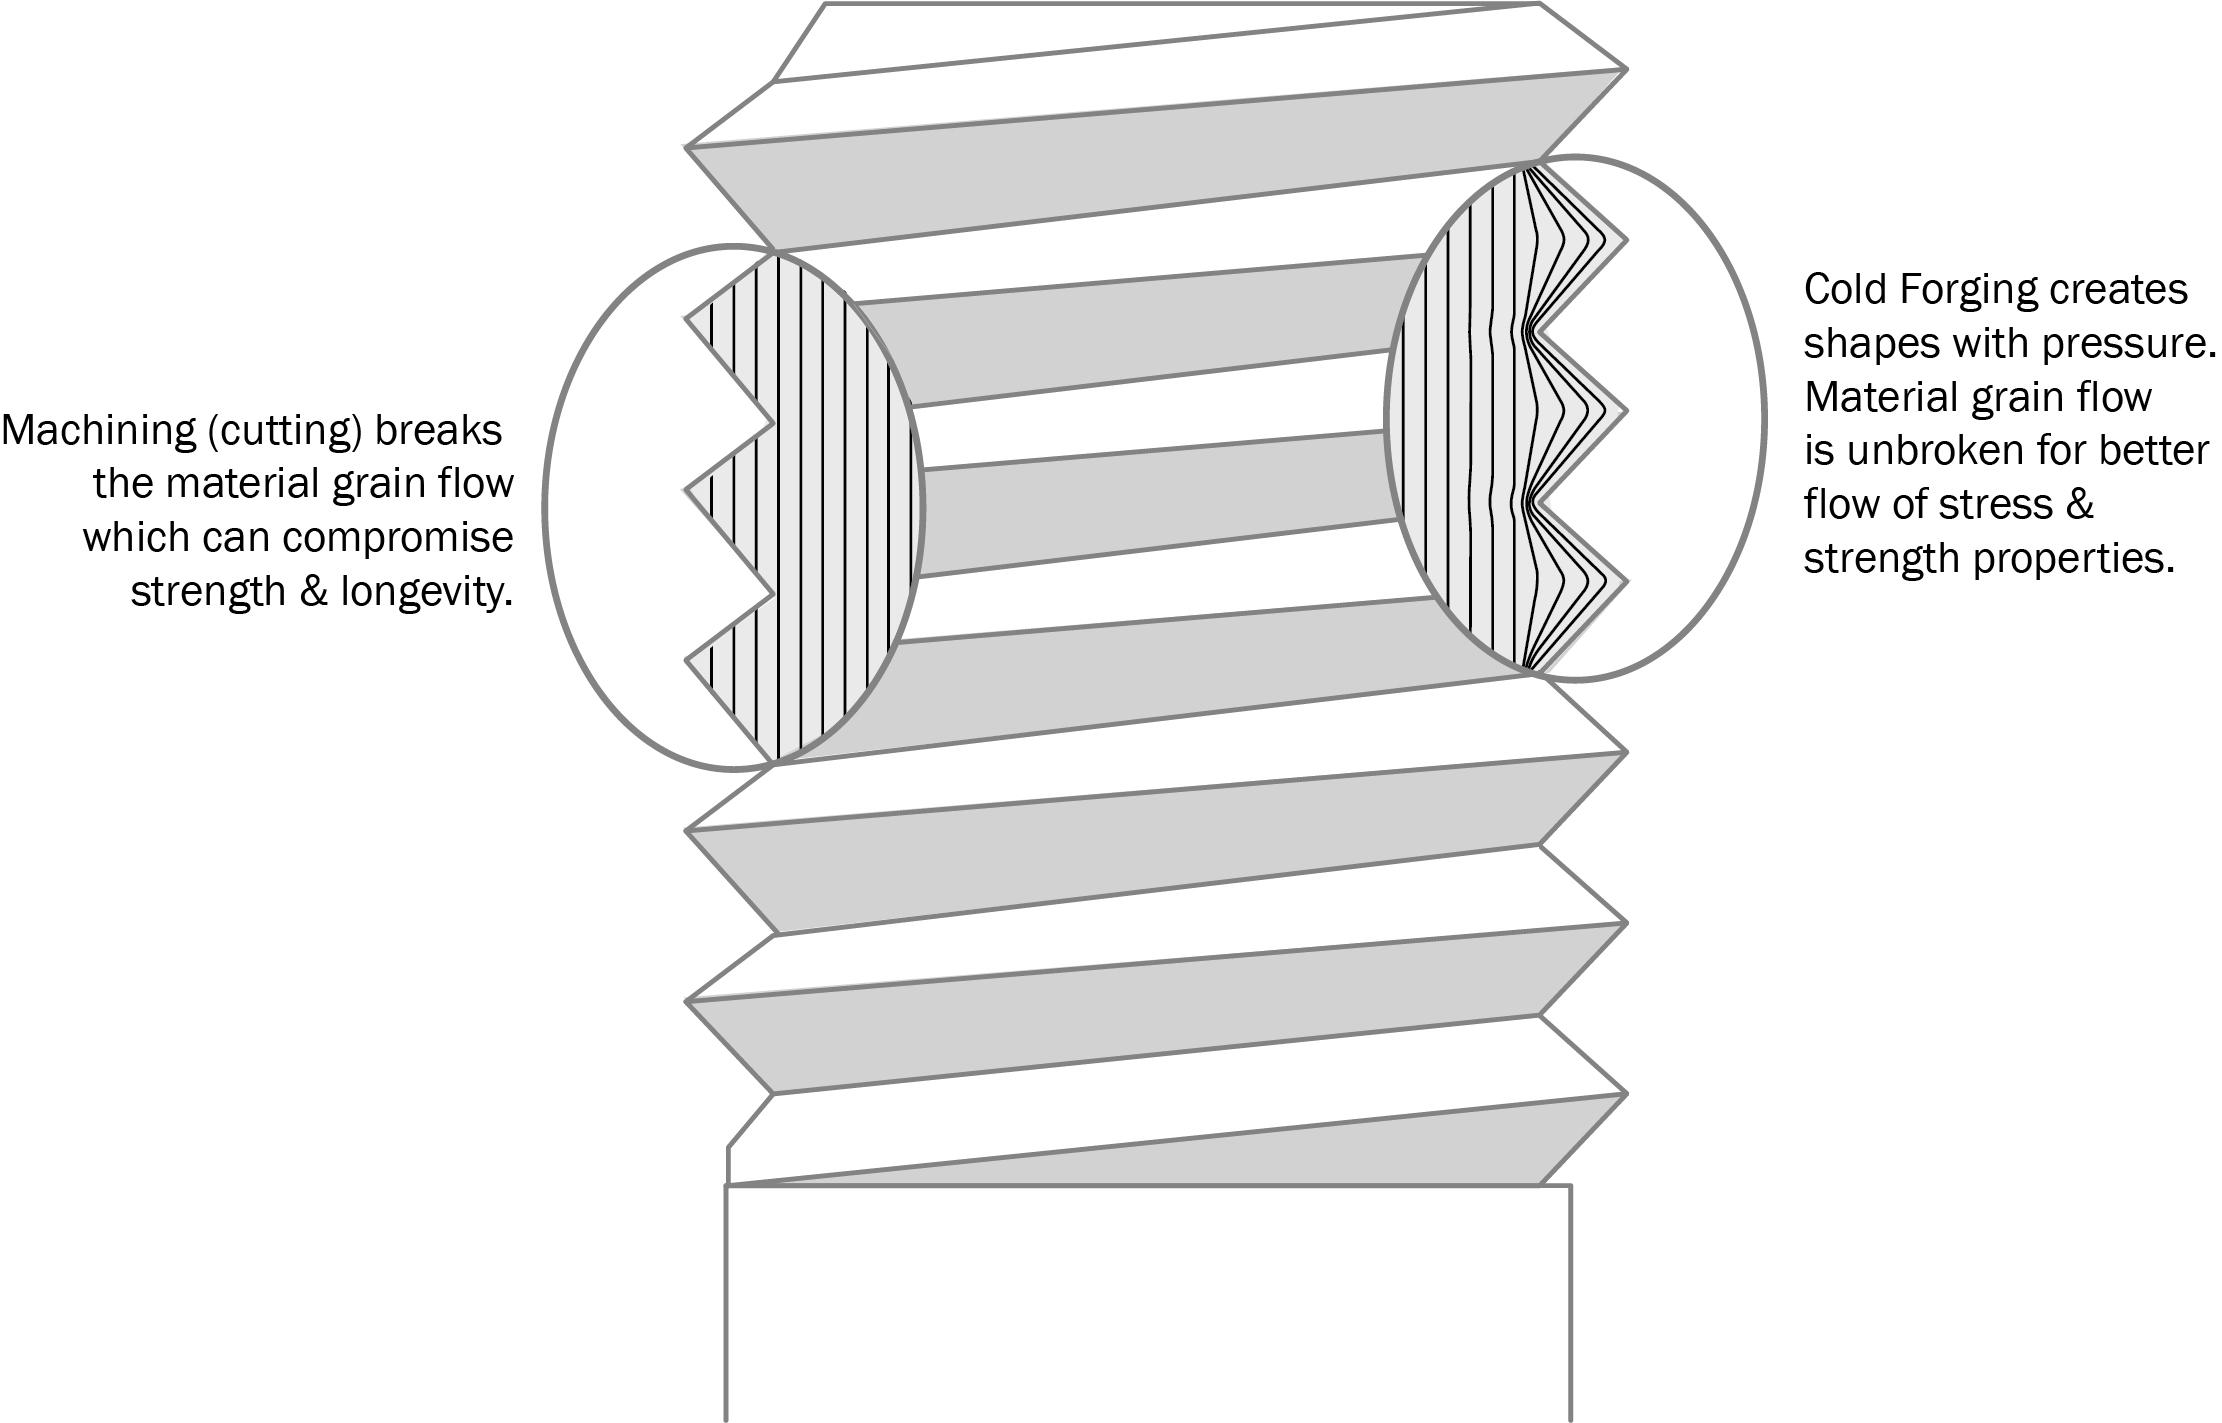 Spoke Tech: Grain Flow from Cold Forging